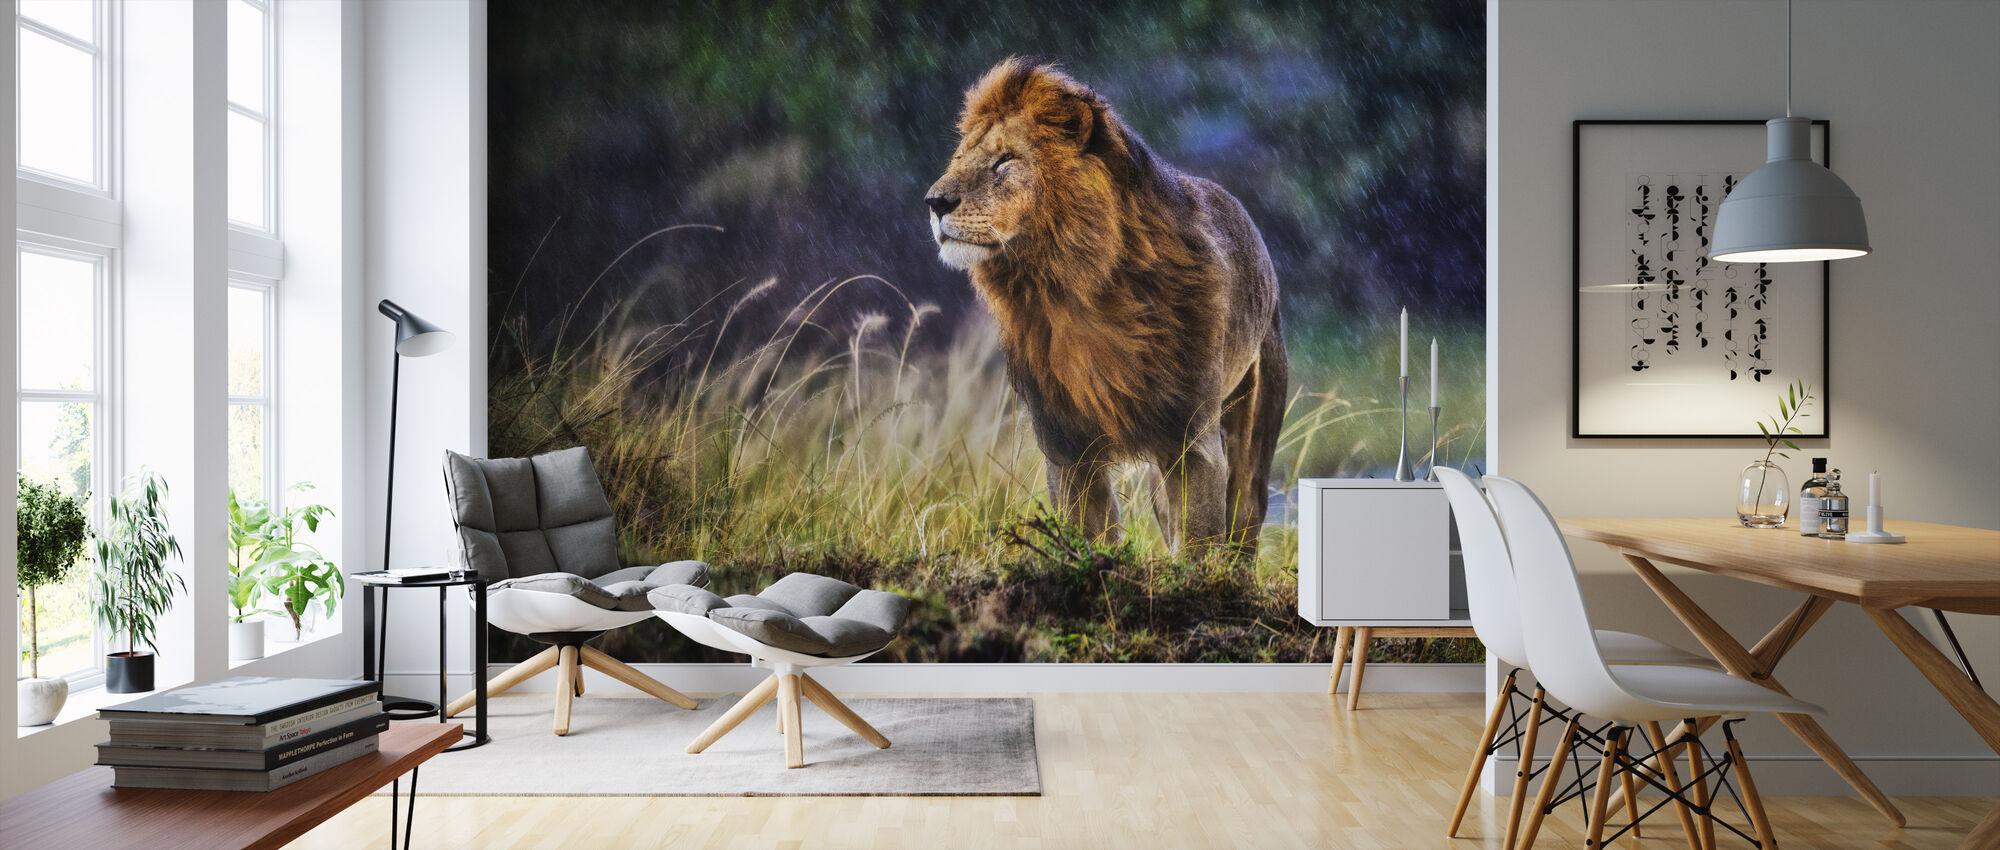 Under the Cold Rain - Wallpaper - Living Room